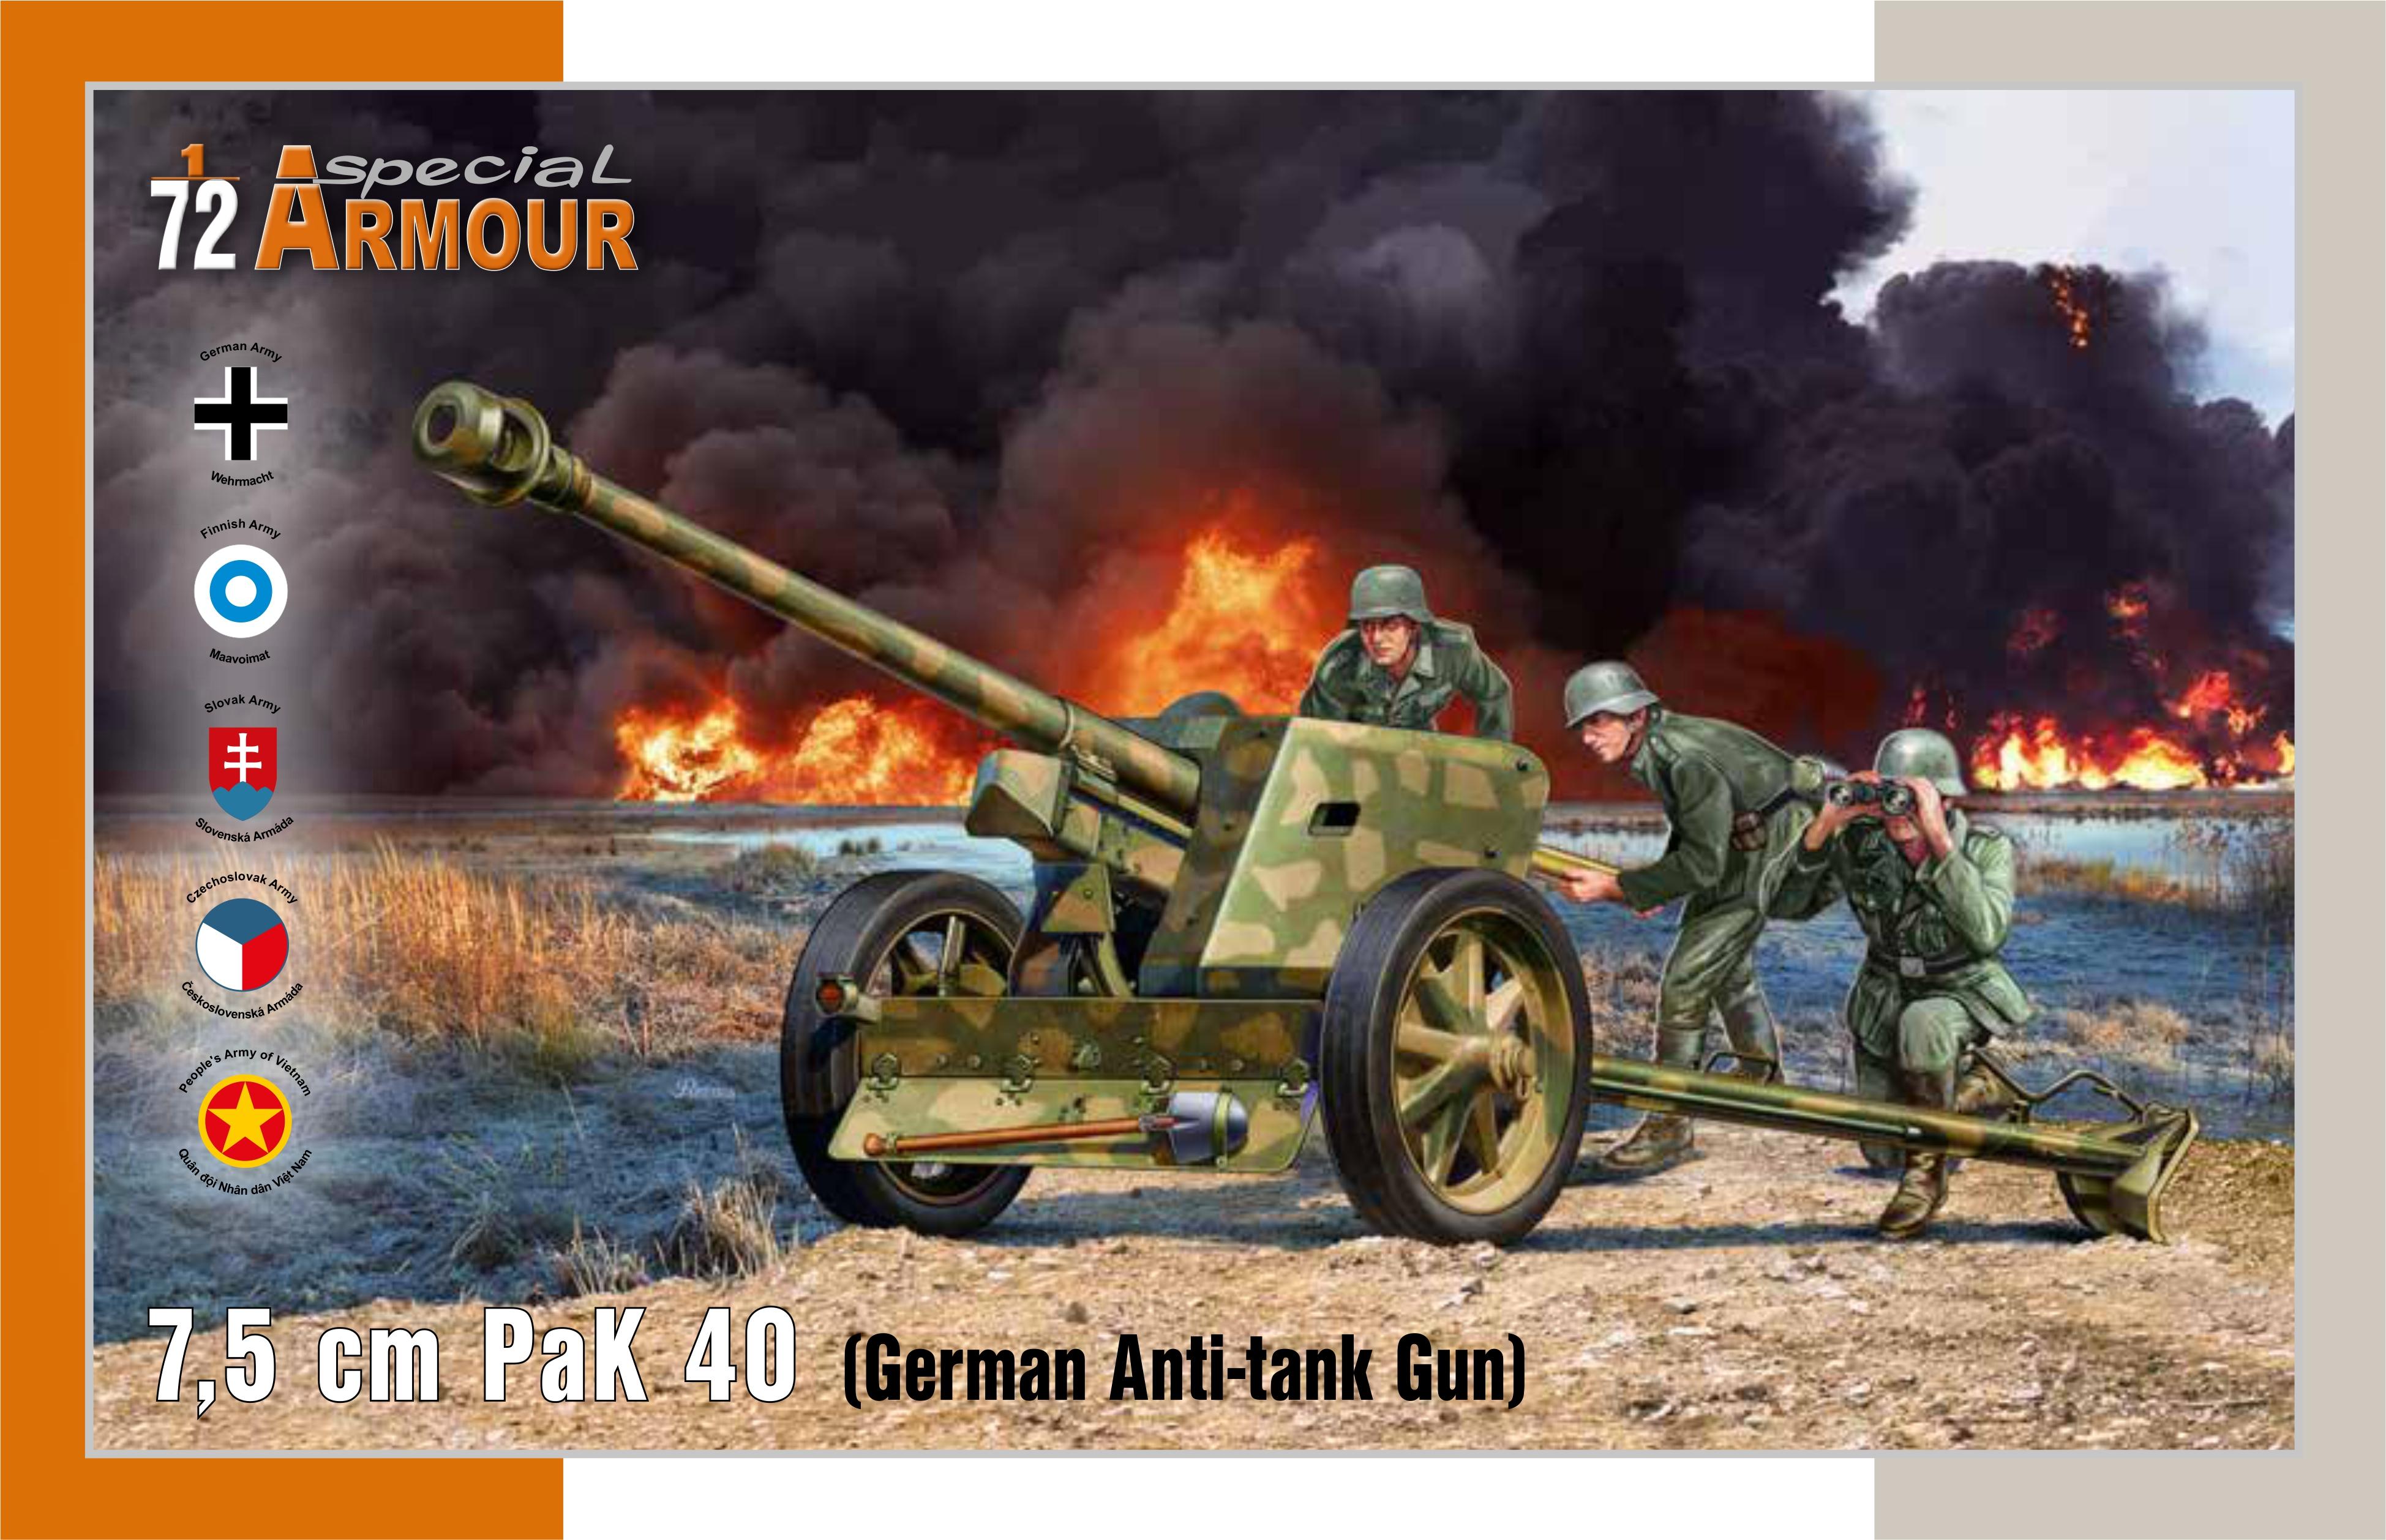 Special Hobby 1/72 7,5 cm PaK 40 'German Anti-tank Gun'